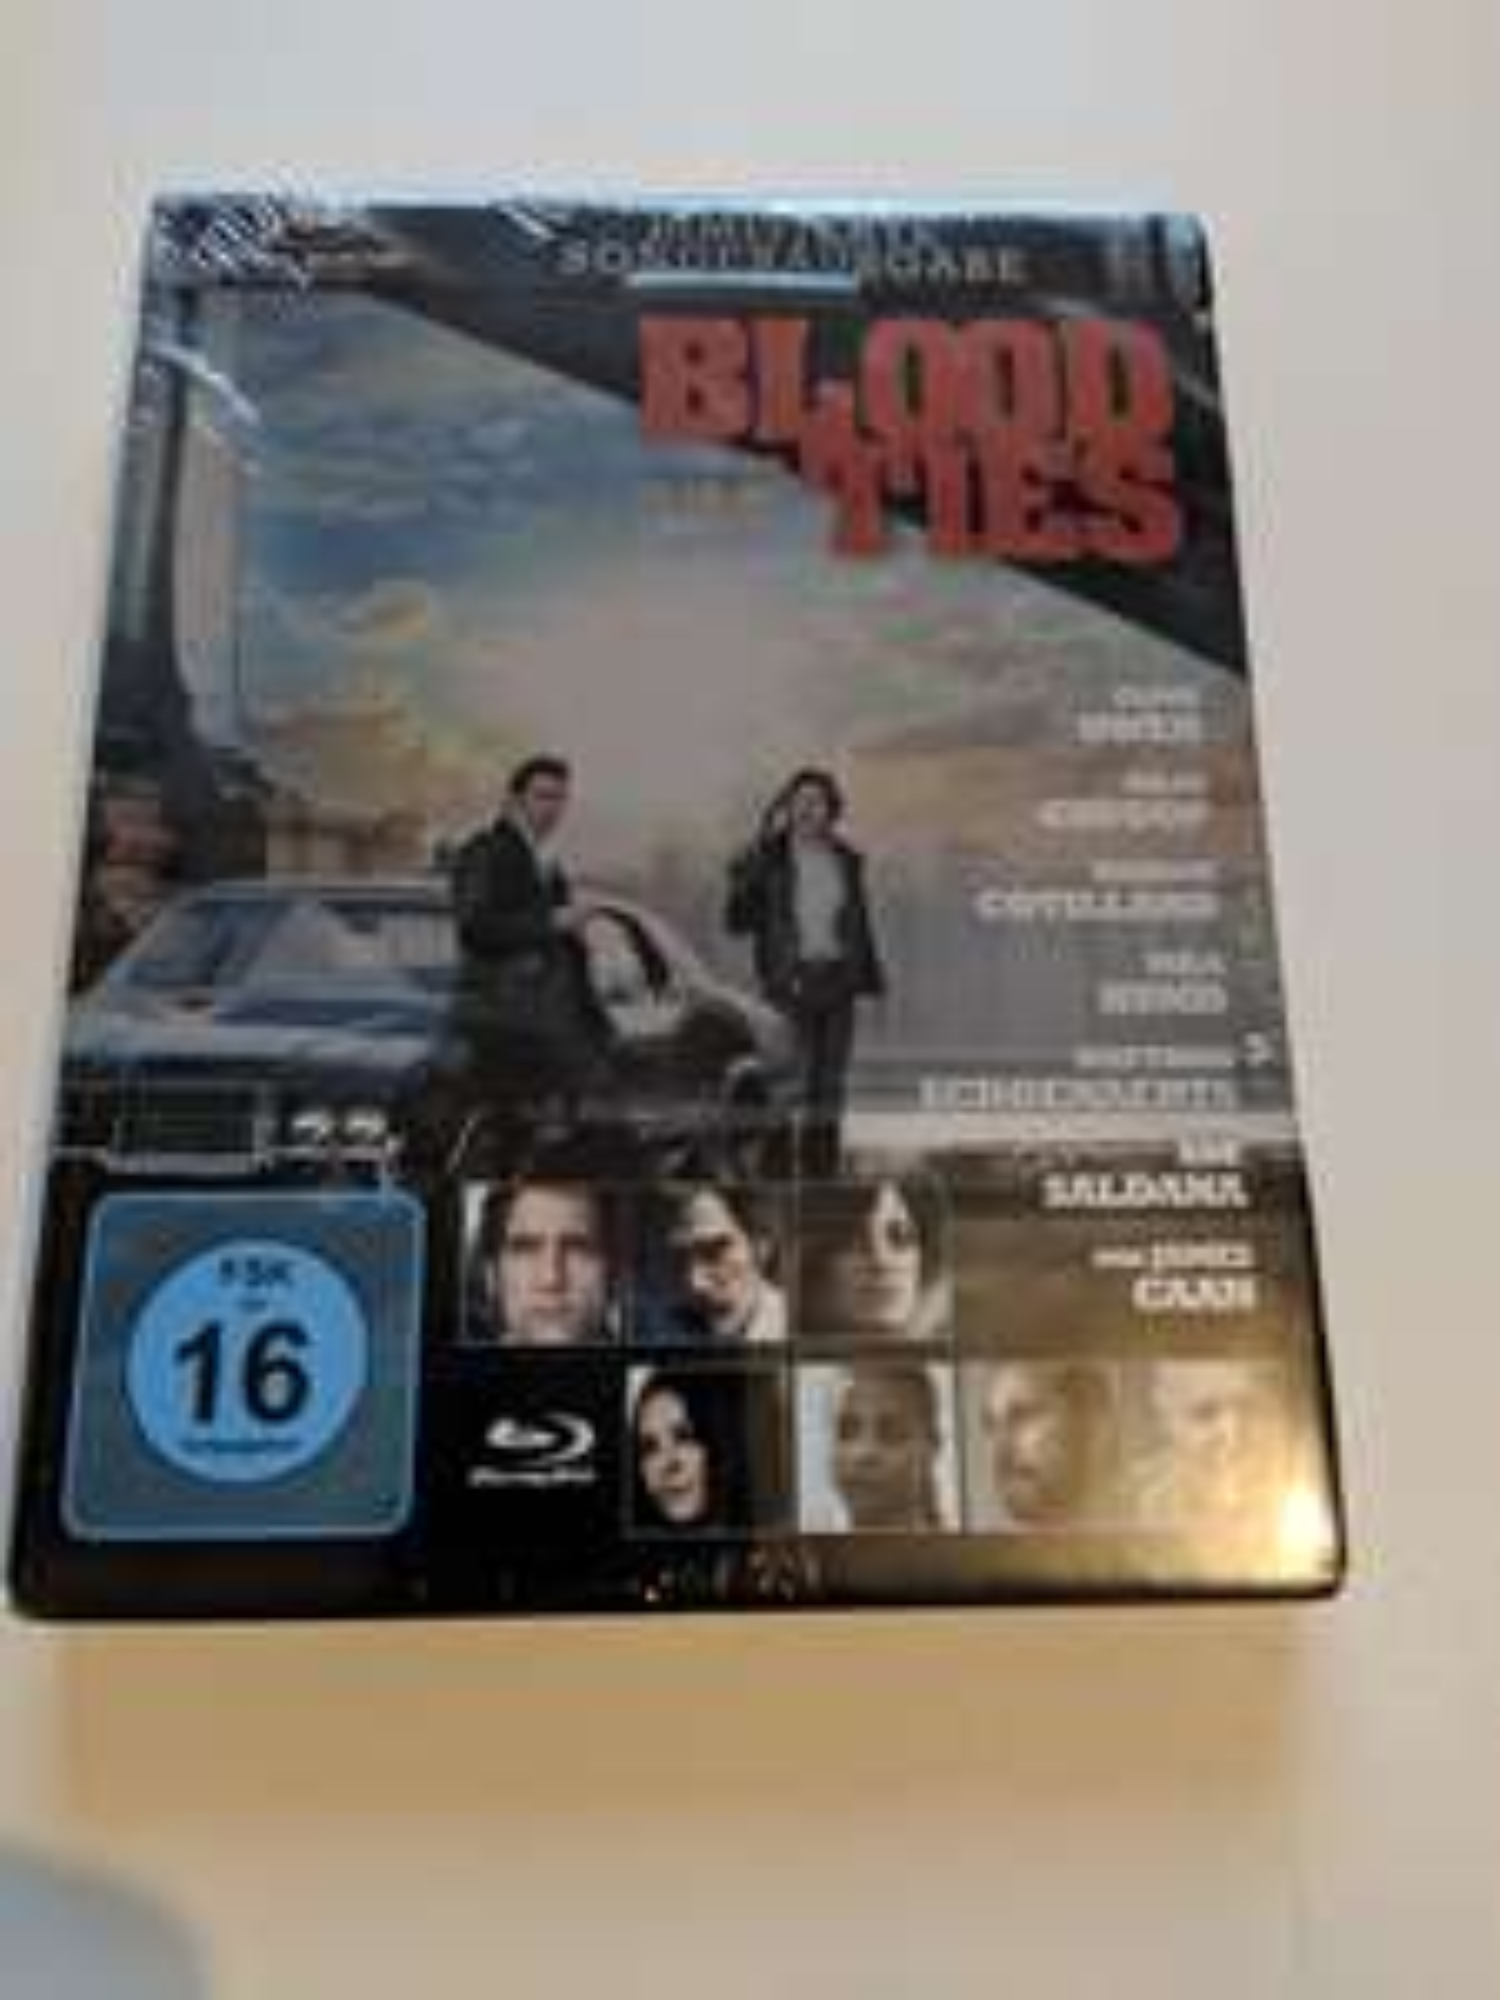 [Blu-ray] Blood Ties - Steelbook [Limited Edition] Lokal?